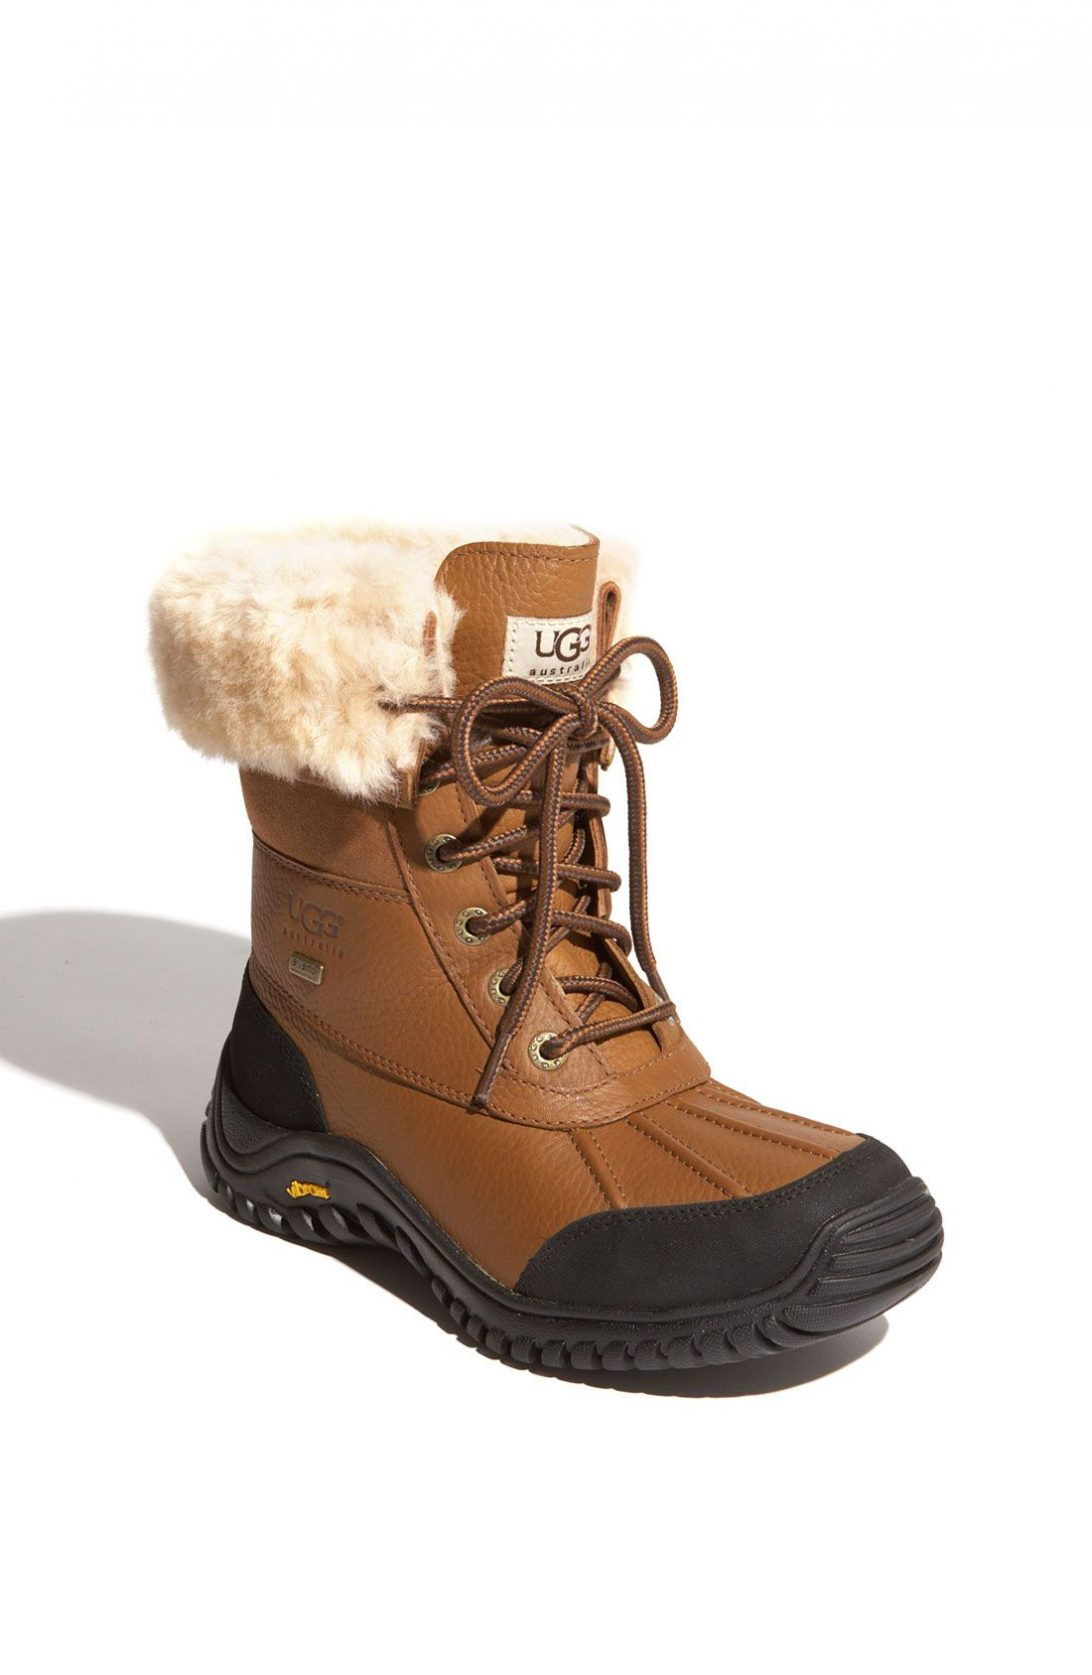 Keen Shoes Winter